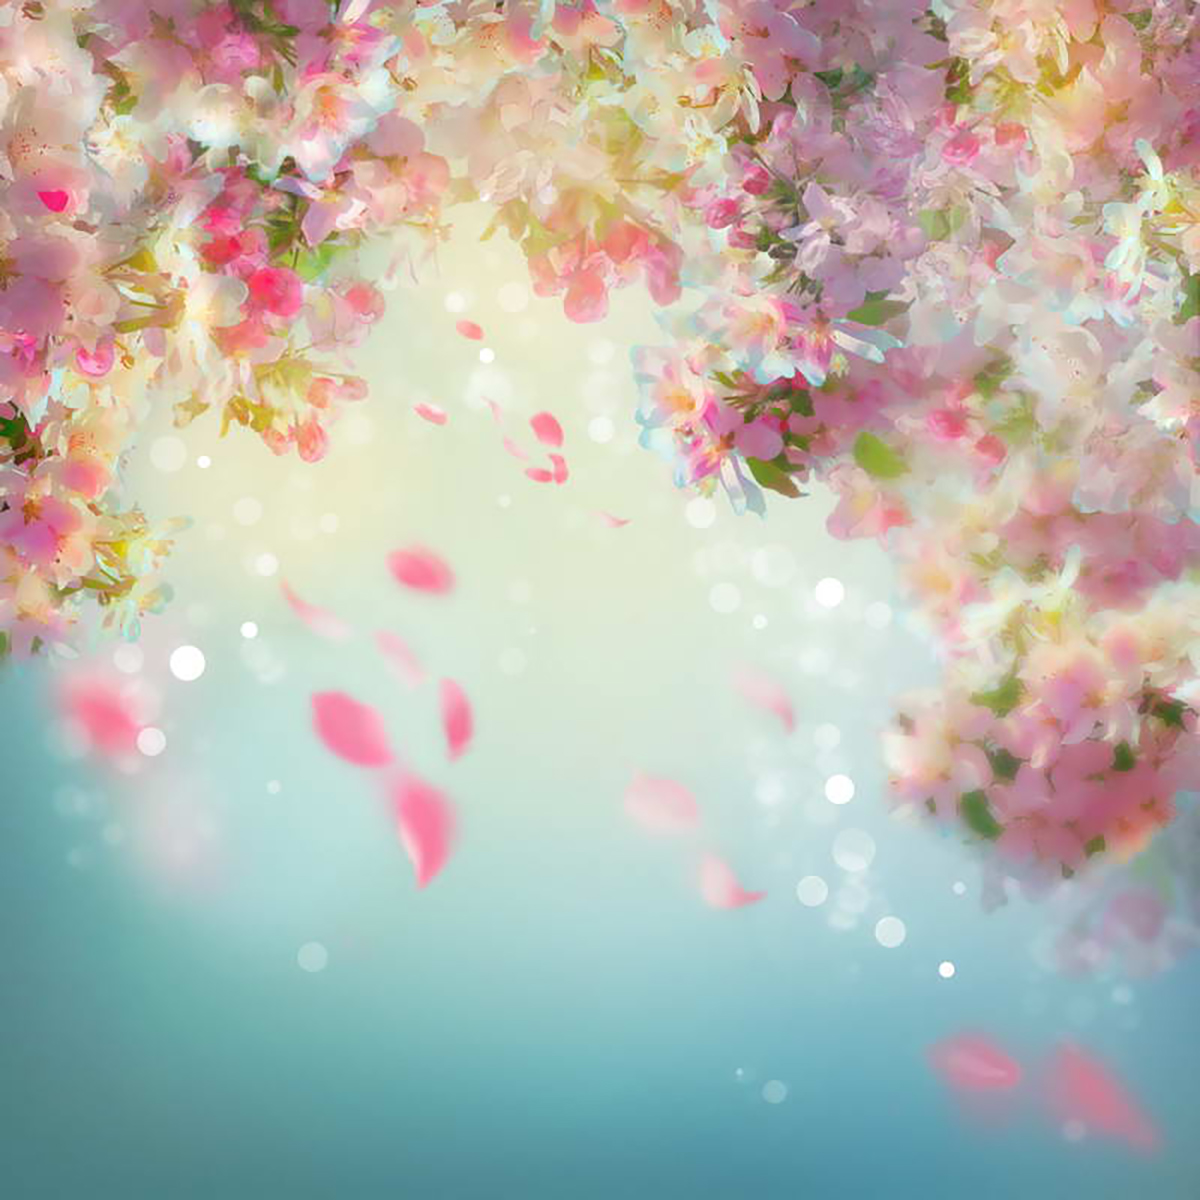 Allenjoy Photography Backdrops Bokeh Pink Flowers Blur Photo